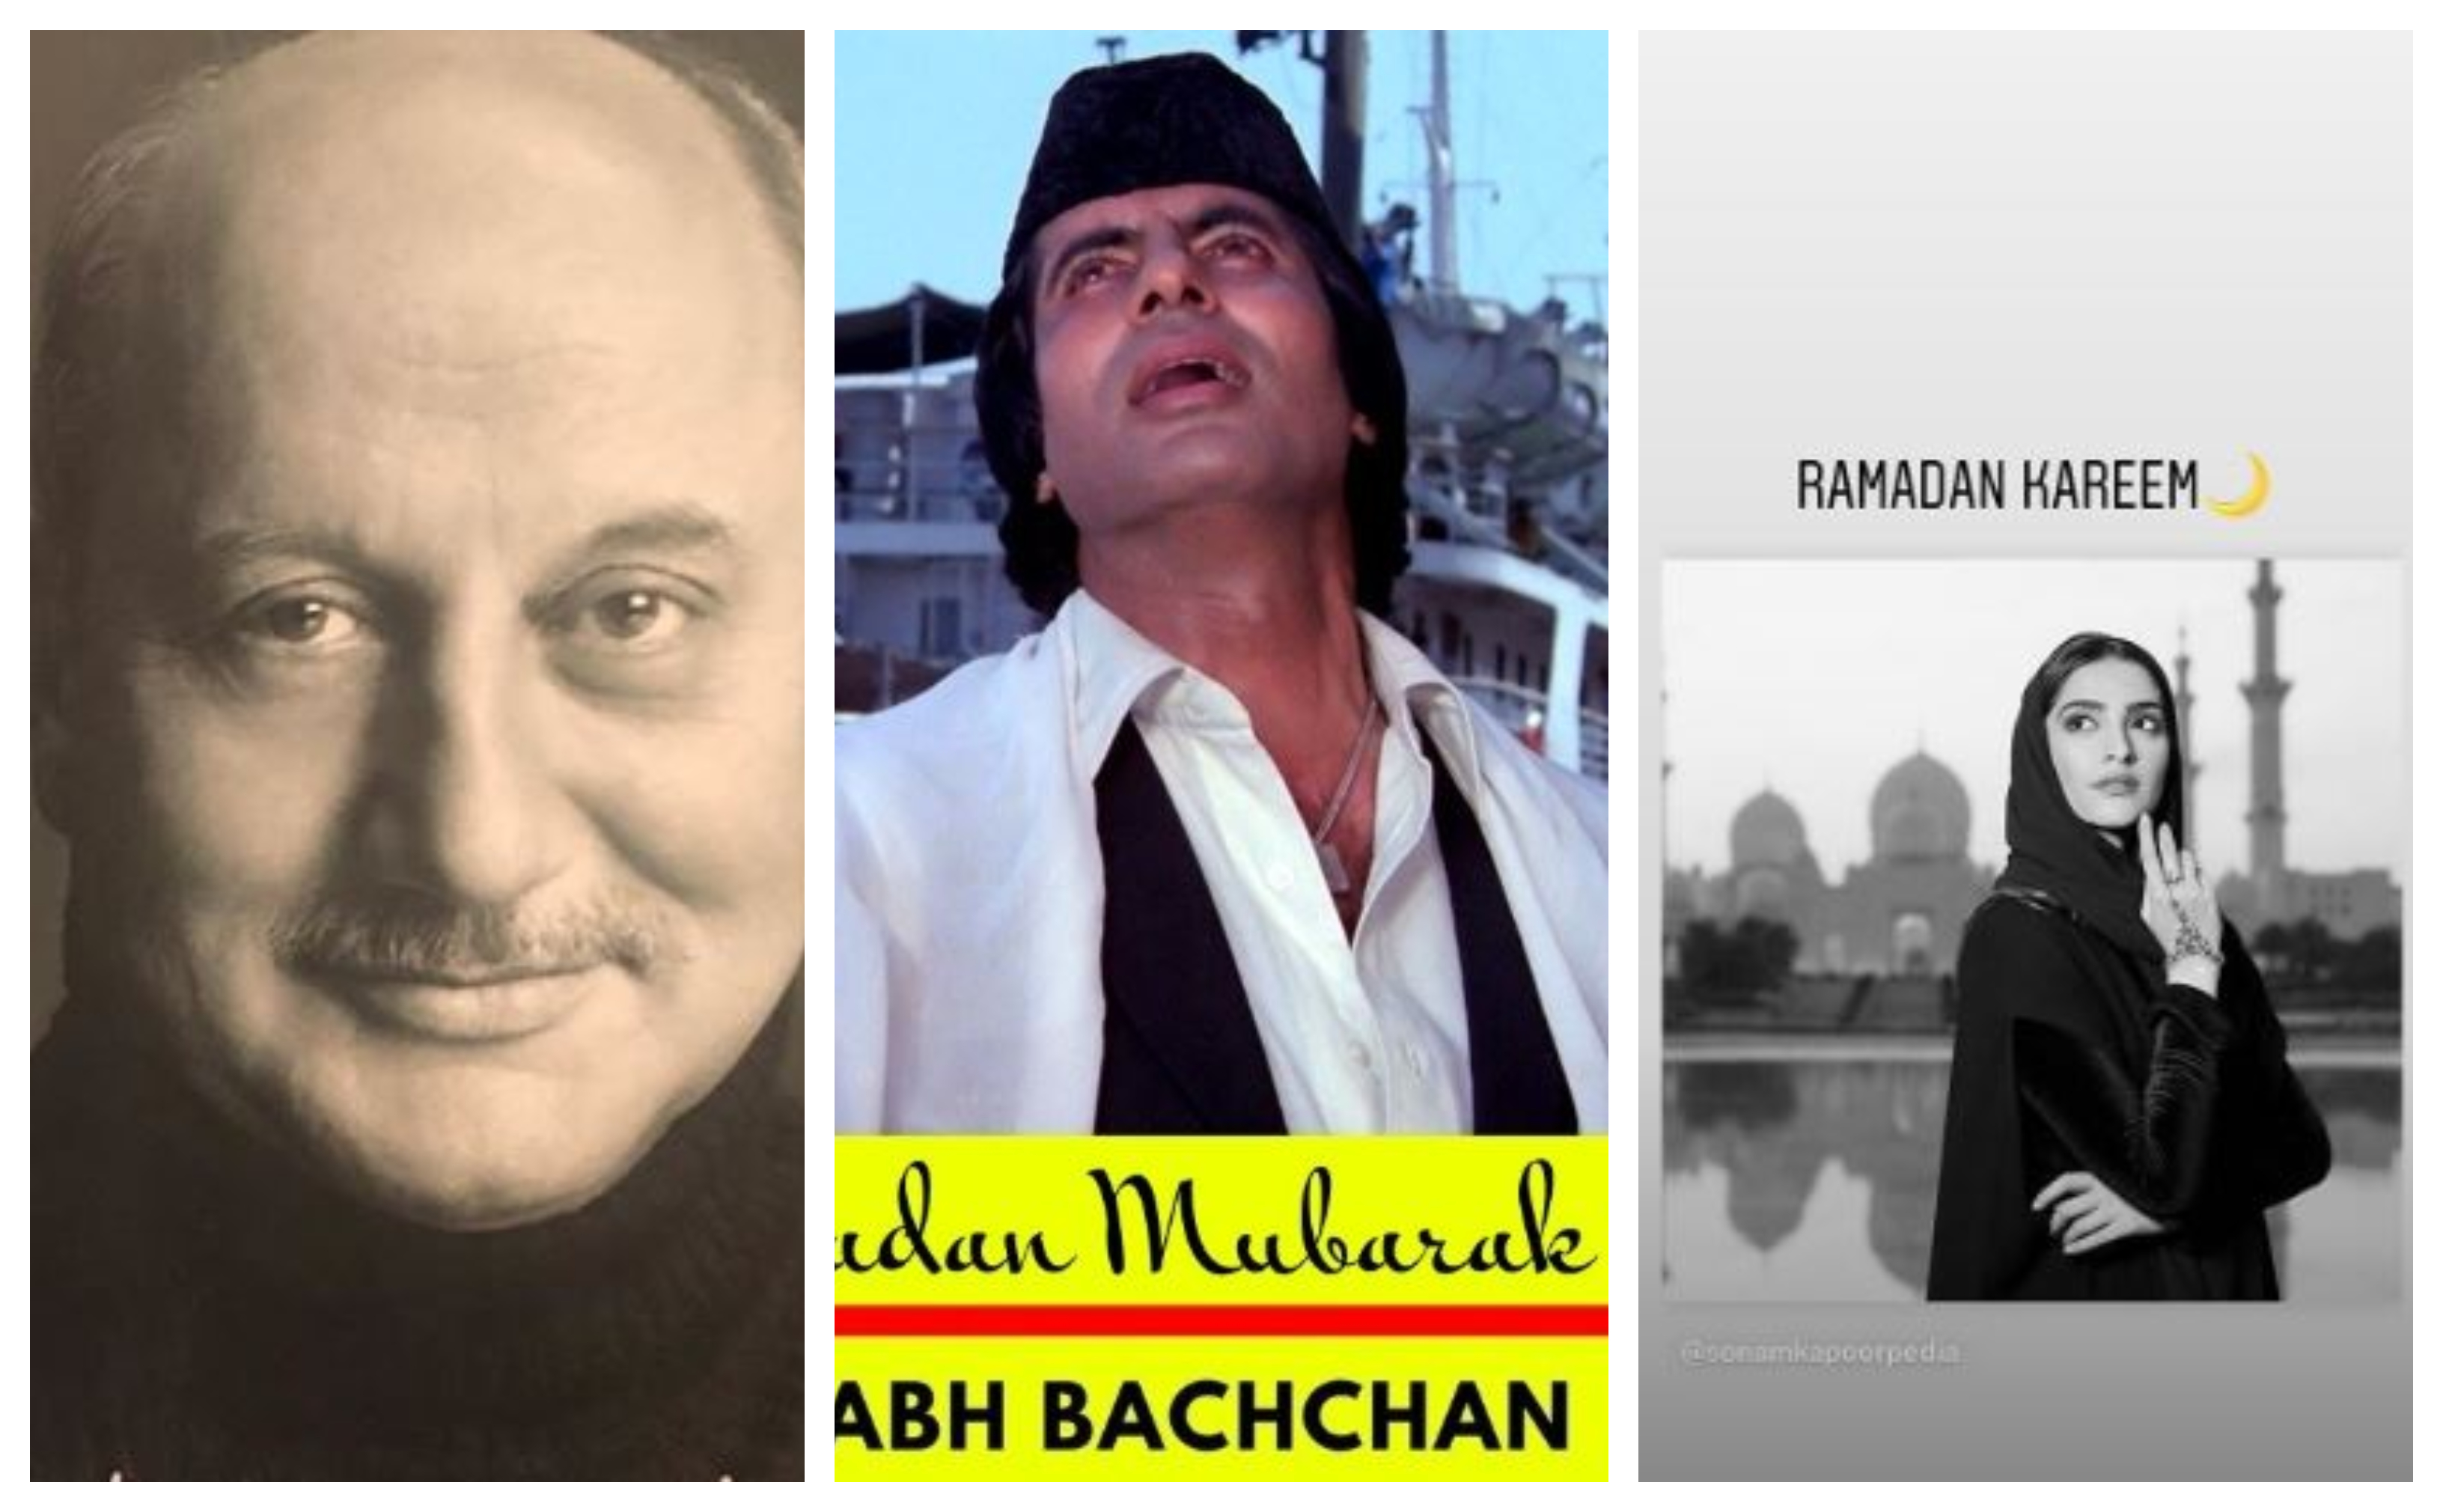 Amitabh Bachchan, Anupam Kher, Ramadan Mubarak